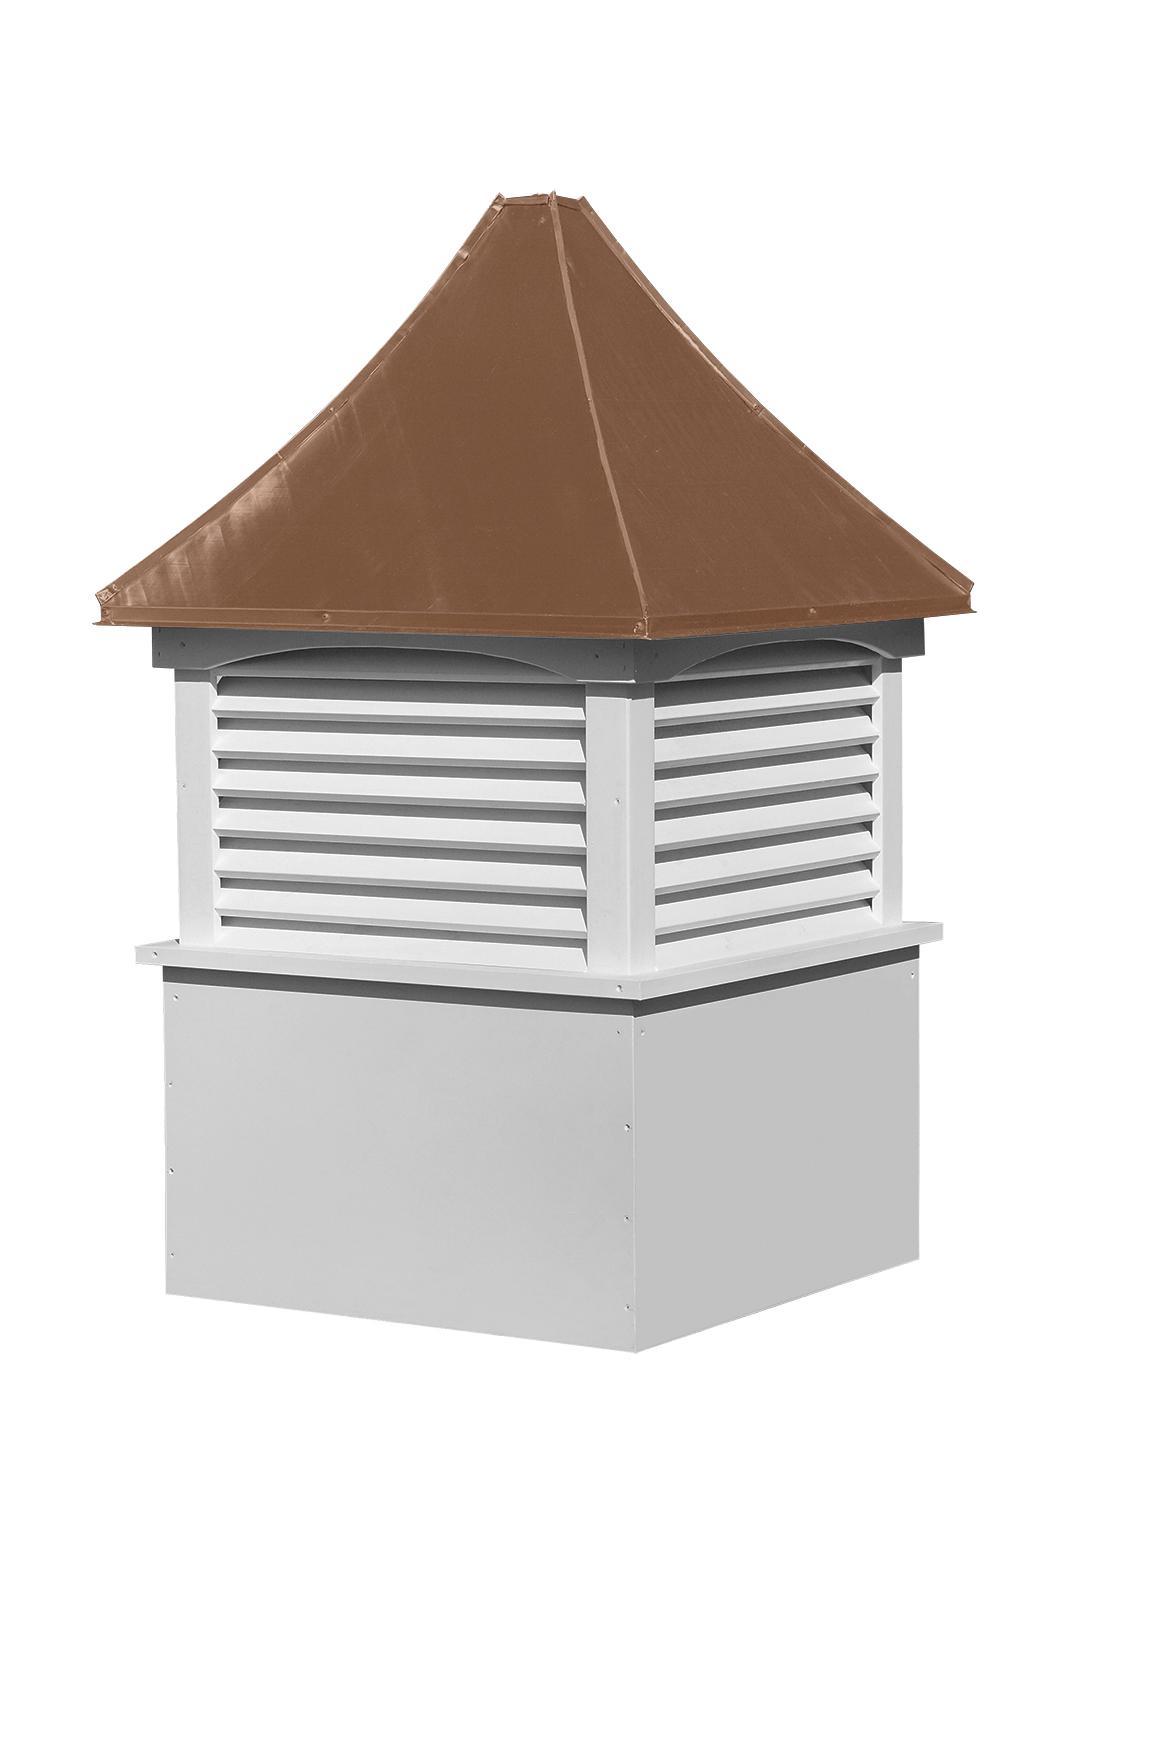 besra cupola (gvlc)